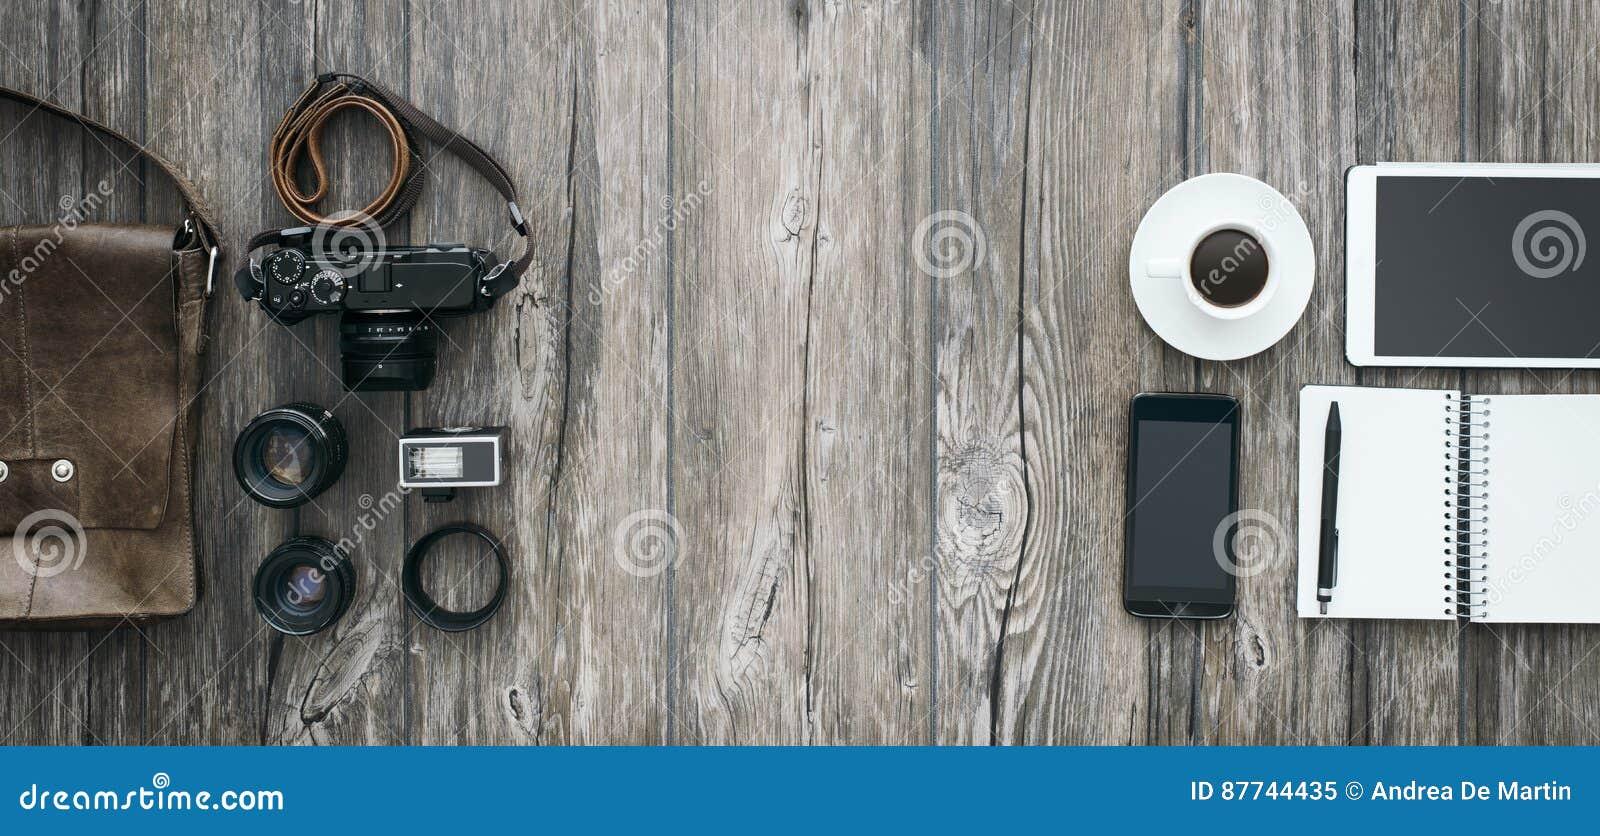 Hipster freelance photographer